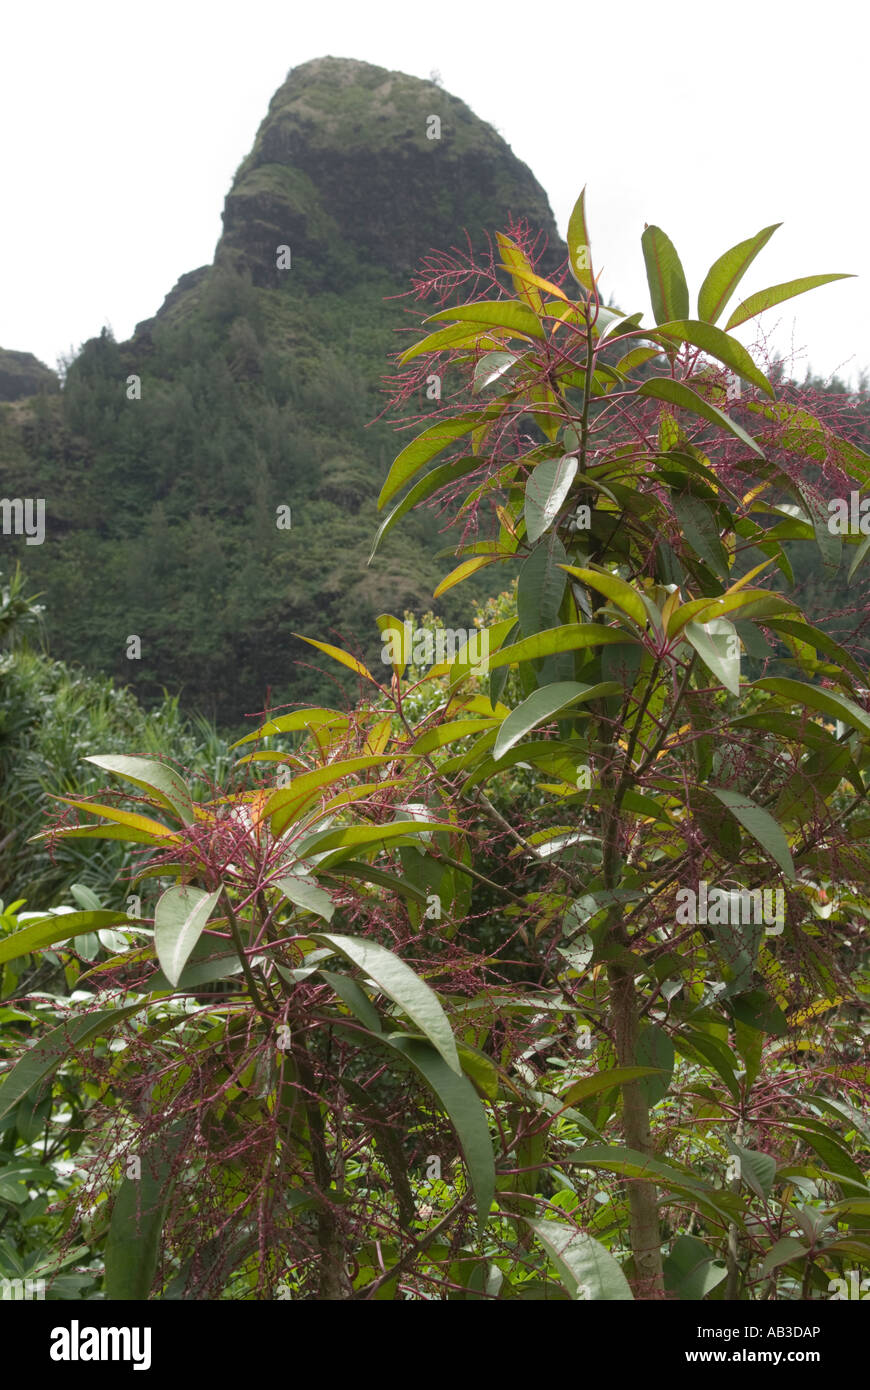 Limahuli Garden And Preserve Stock Photos & Limahuli Garden And ...